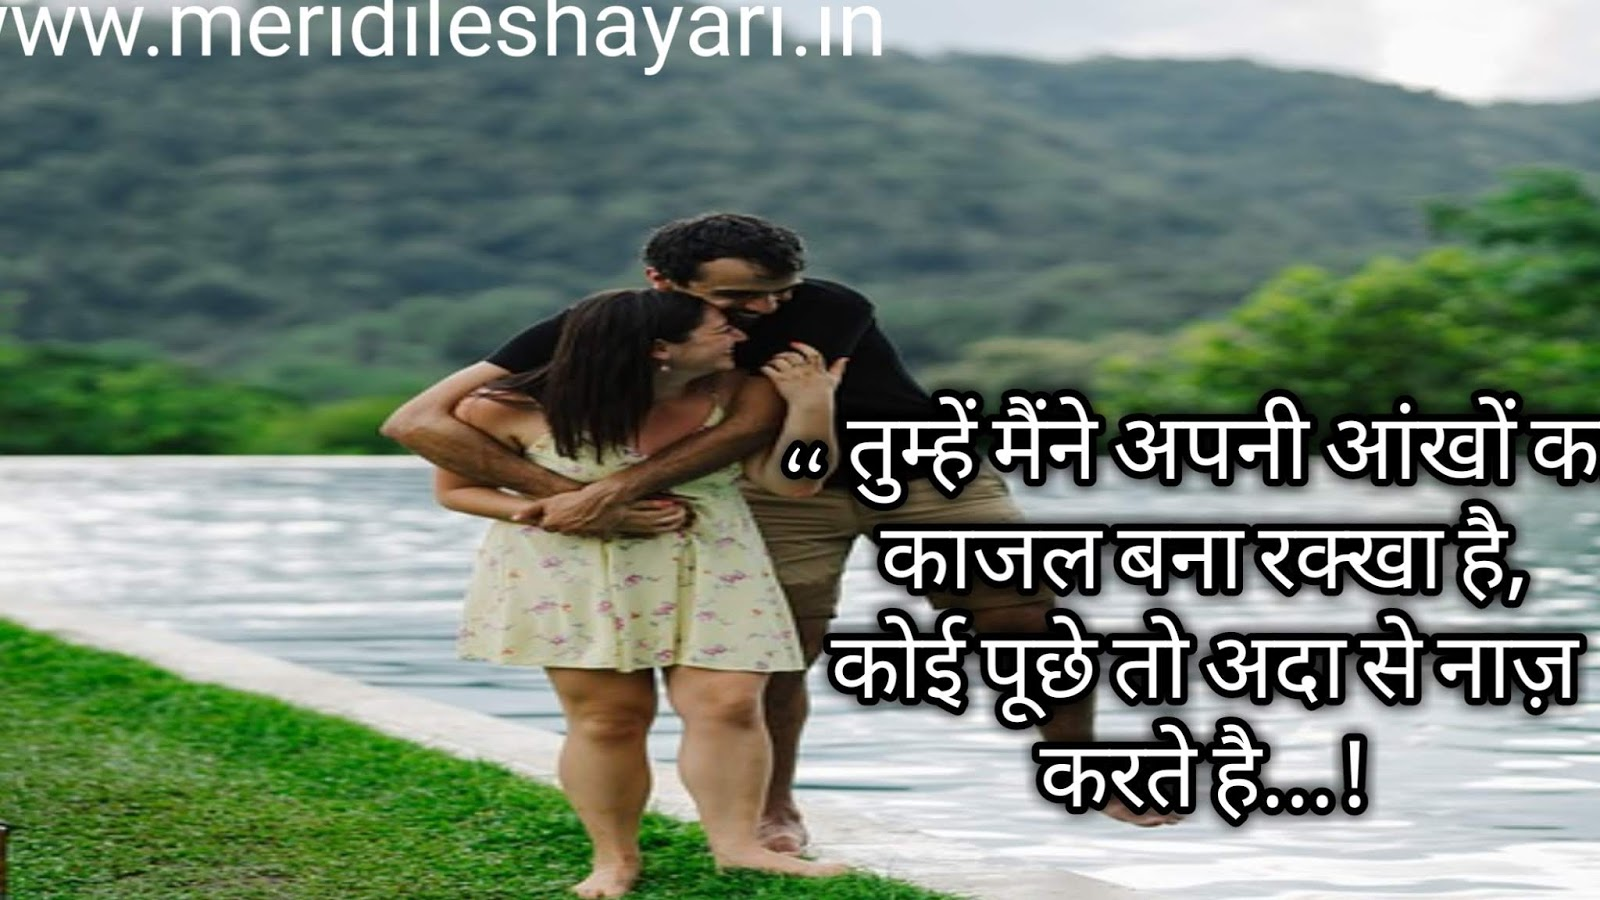 Ankhein Shayari in Hindi | Best Eye Shayari ,eye shayari, eye shayari in hindi, shayari on eye in hindi, eye shayari in english, eye shayari in urdu, shayari for eye in hindi, eye shayari hindi, khoobsurat aankhen shayari,status on my beautiful eyes in hindi,funny shayari on eyes in hindi,nashili aankhen shayari in hindi,tumhari aankhen shayari,uff ye aankhen shayari,khamosh aankhen shayari,aapki aankhen shayari,tareef shayari on eyes,2 line shayari on eyes,katil nigahen shayari hindi,khamosh nigahen shayari,nigahen shayari in urdu,2 line shayari on nigahen,jhuki nazar shayari,nazar shayari urdu